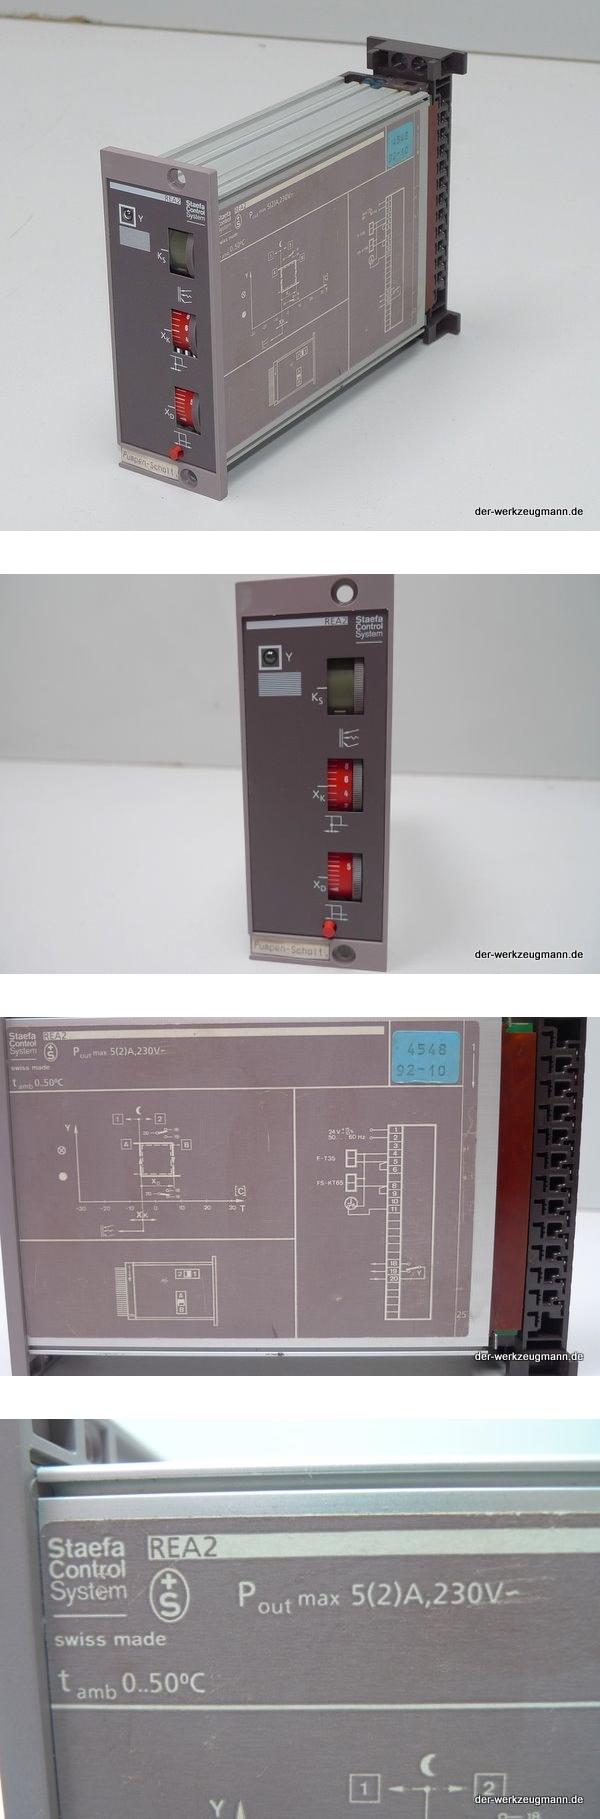 Landis Staefa Control REA-2 Regler Controller 4548 92-10